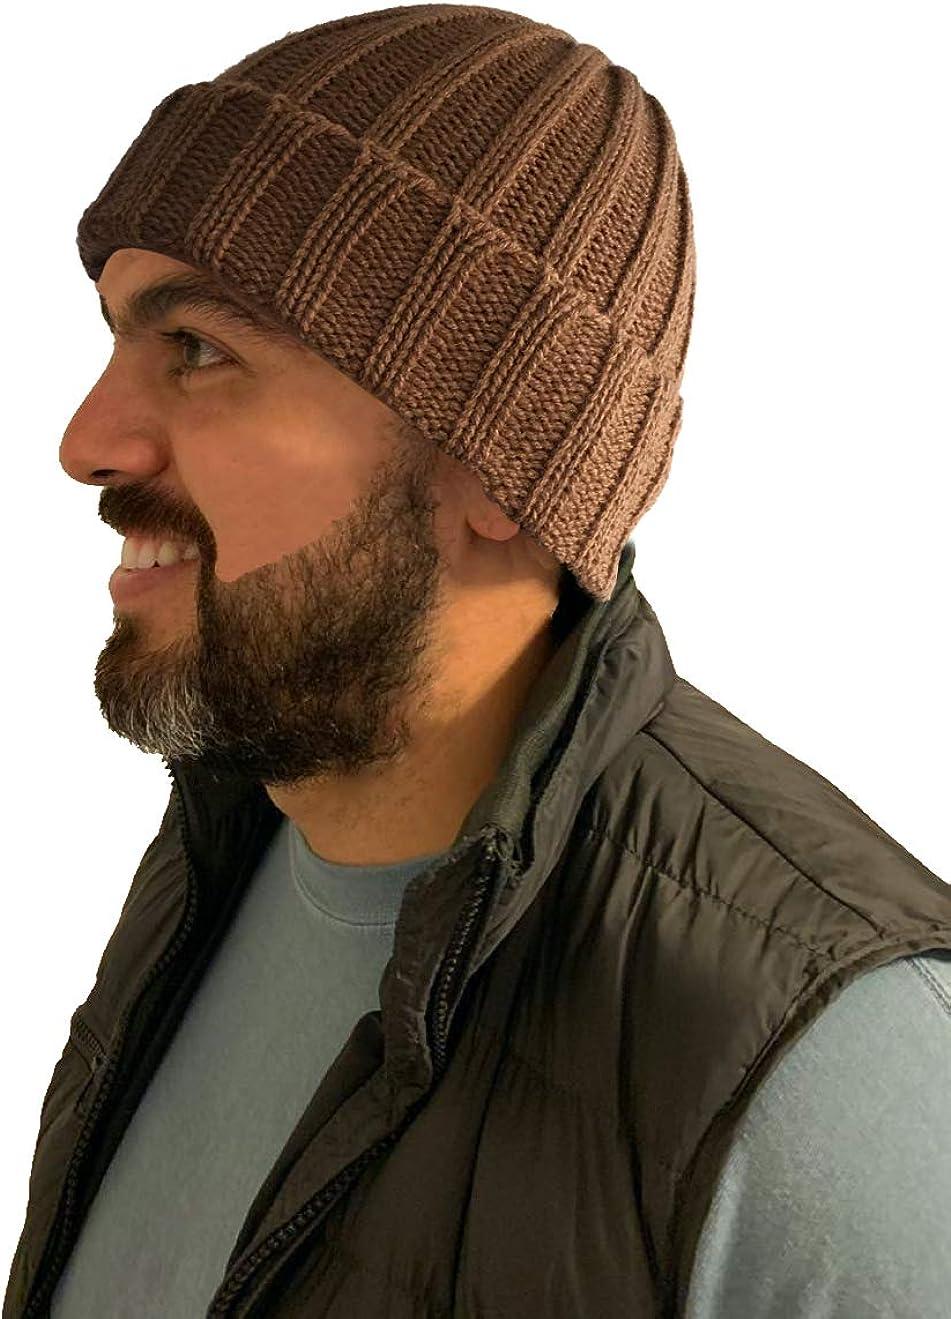 TINKUY PERU - Alpaca Wool Knit Hat + Beanie Special price quality assurance Mittens Skull Cap